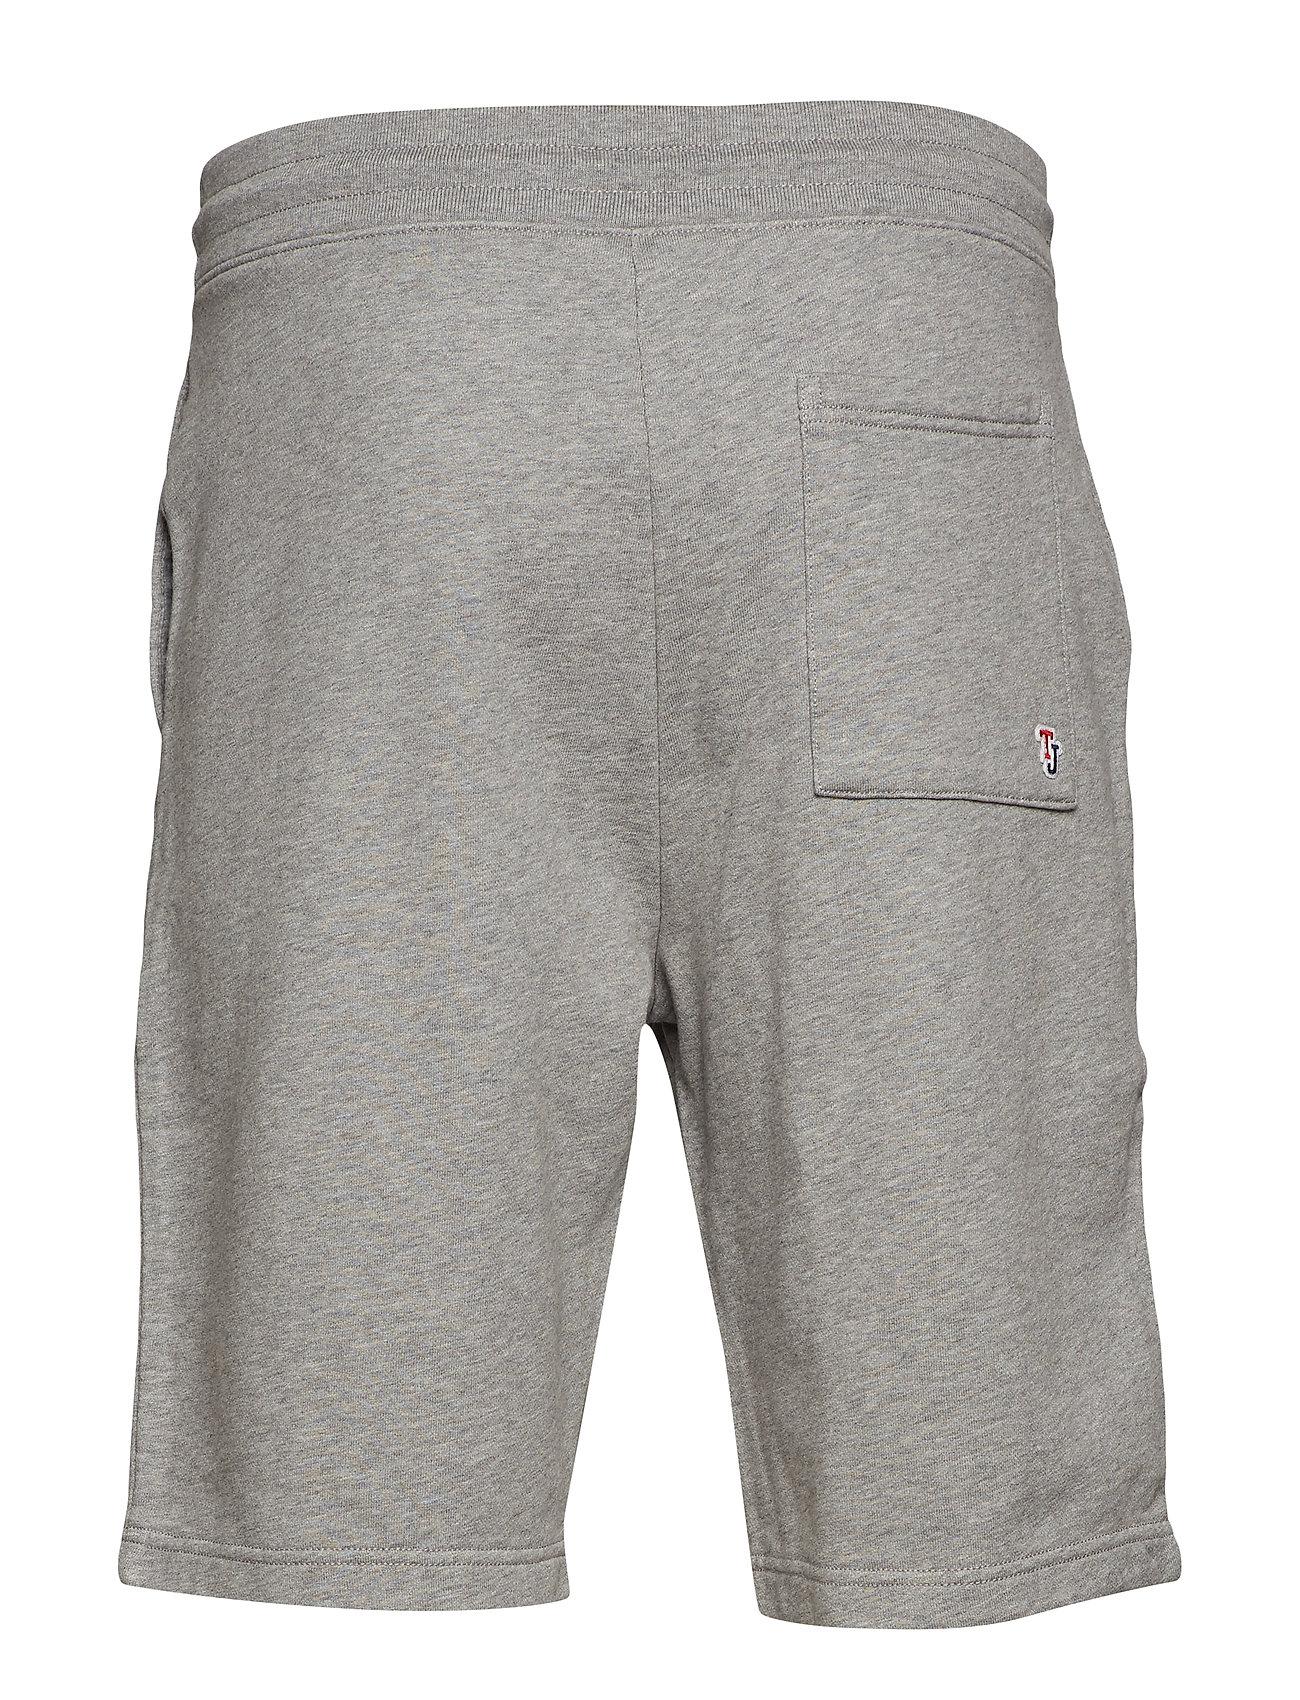 HtrJeans Classics Tommy Grey Tjm Slt bWEH9IYD2e